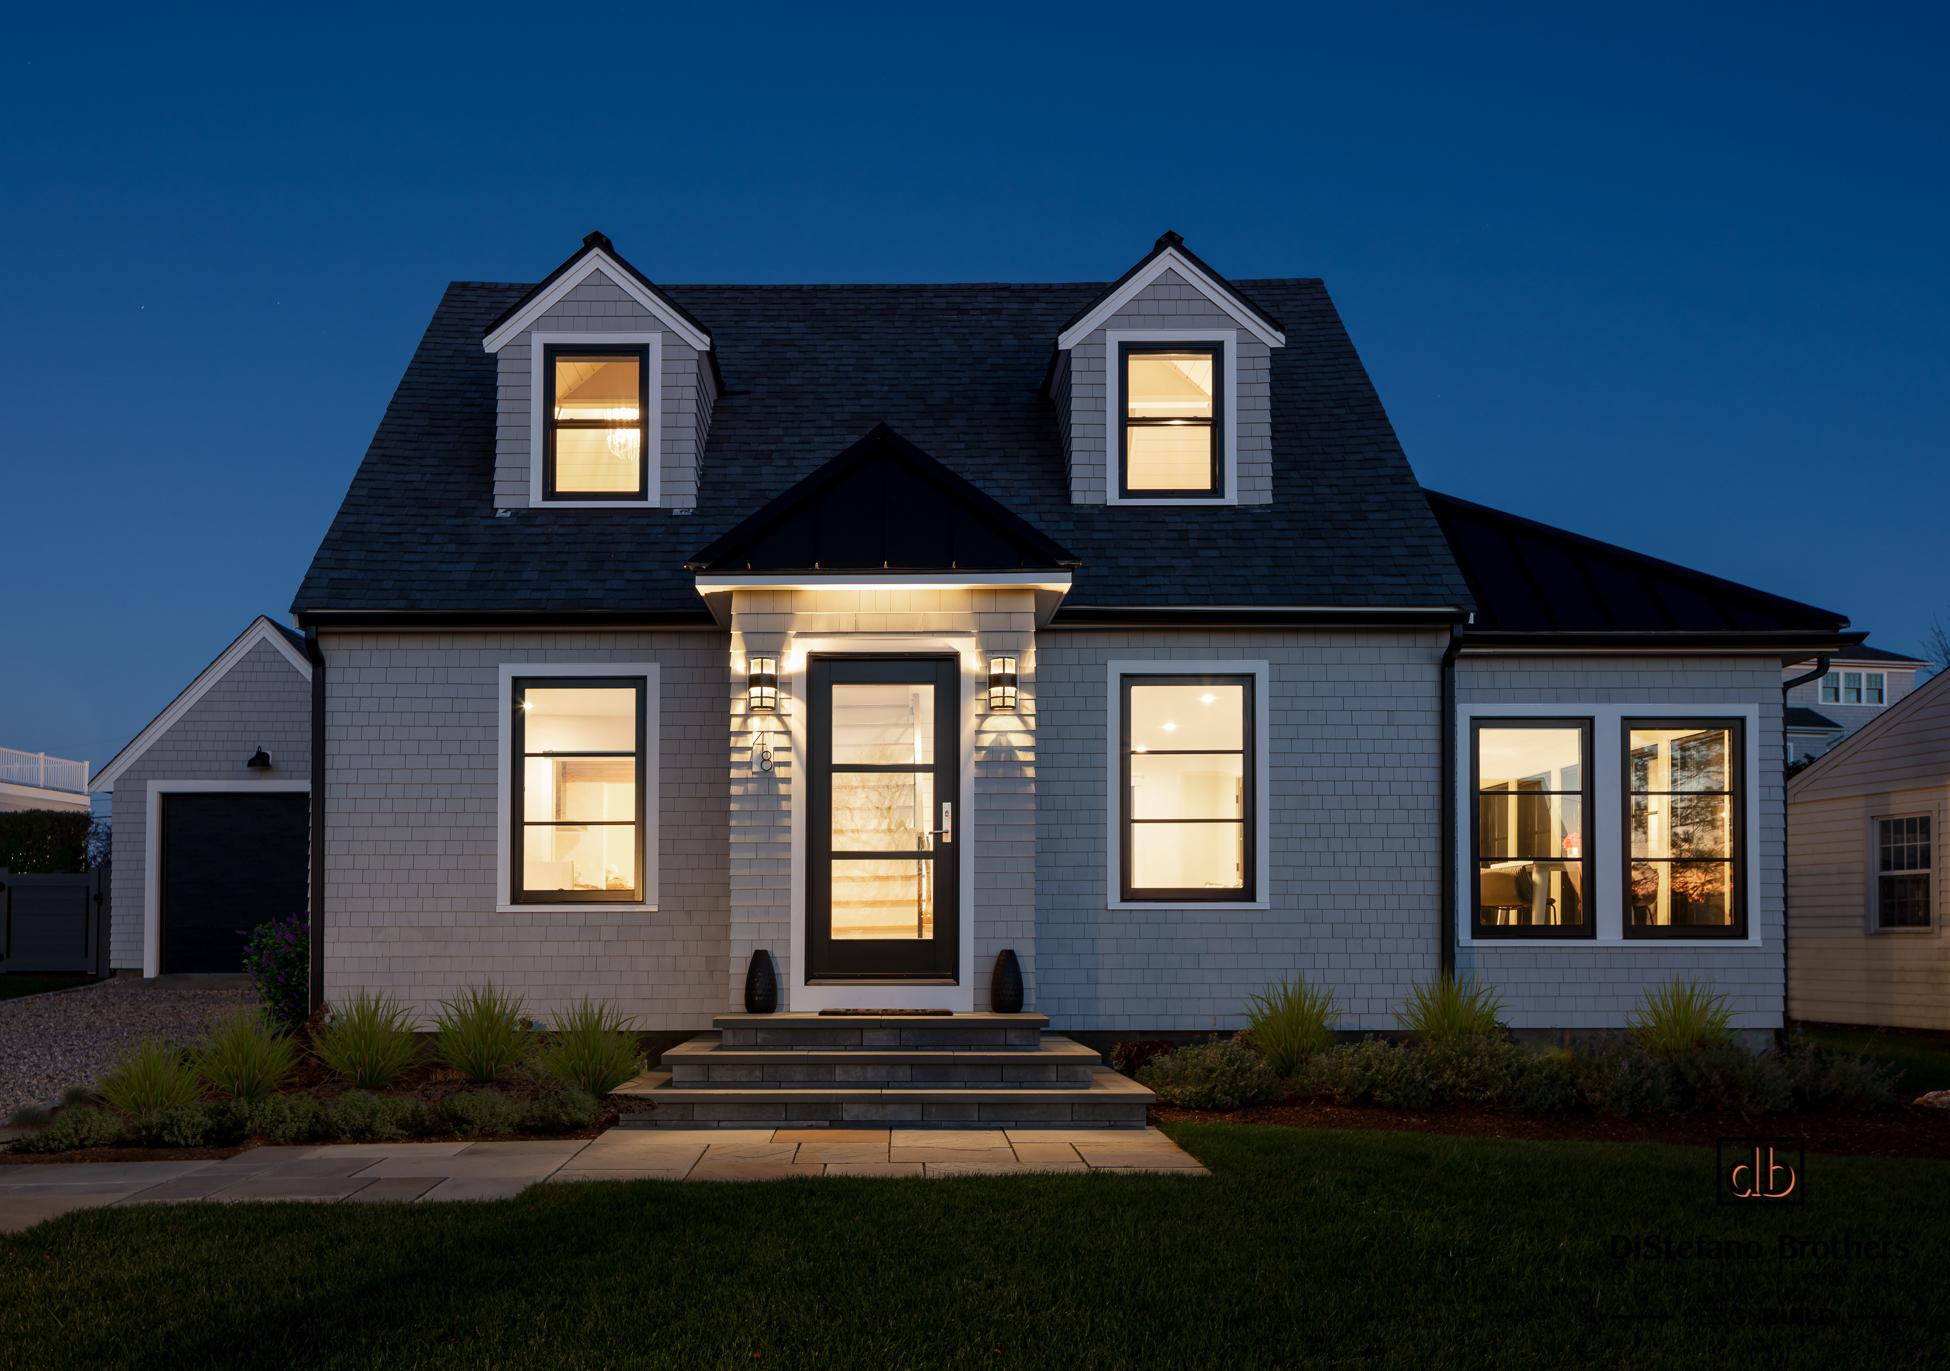 Bonnet Bliss, Rhode Island, Whole House Remodel